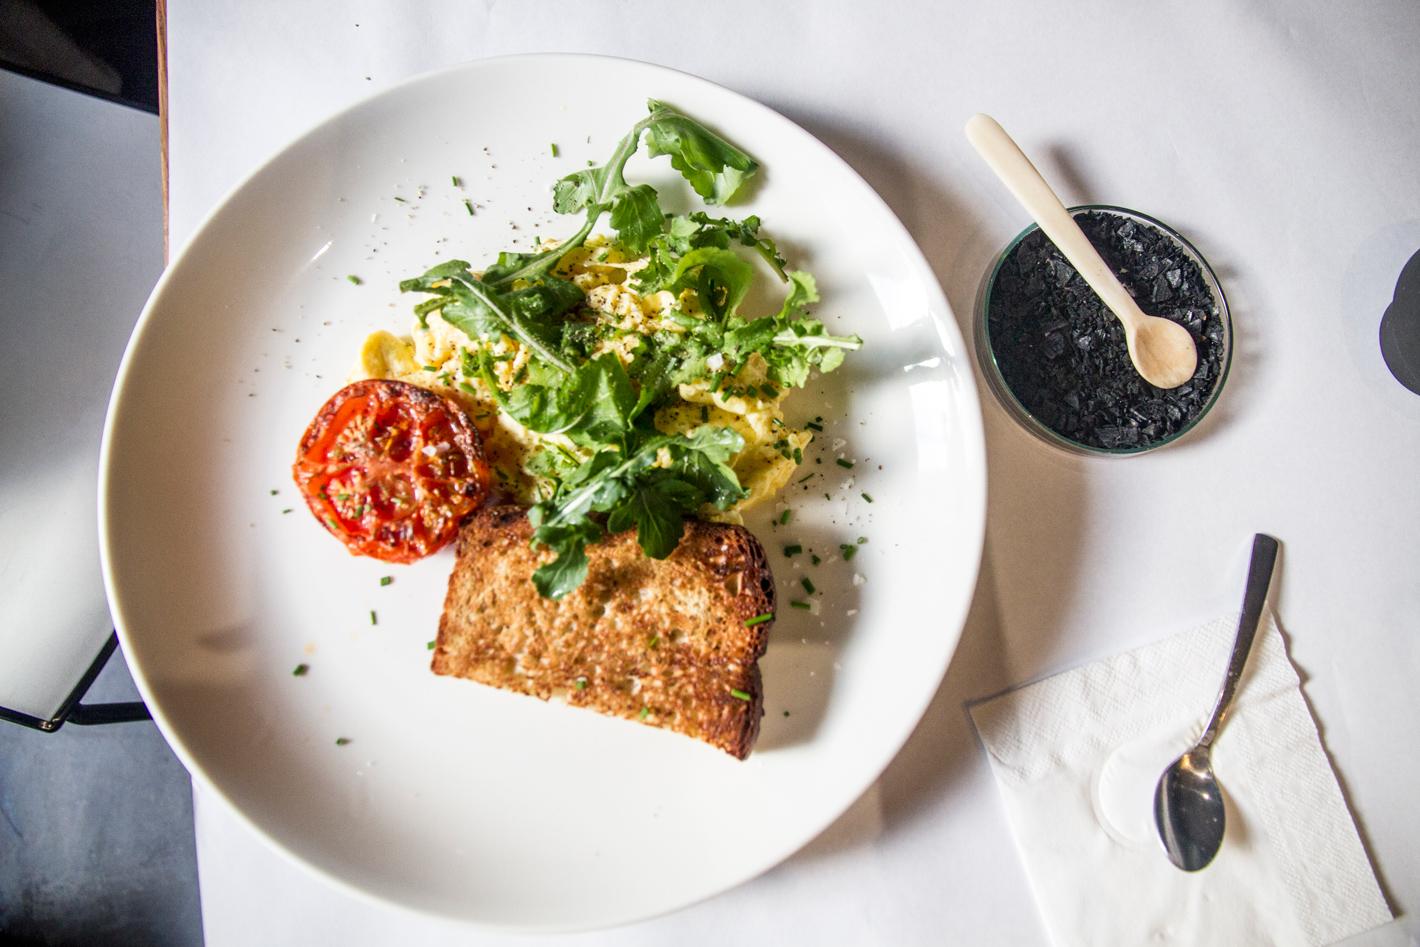 Hemel Huijs breakfast of scrambled egg, roasted tomato and mosbolletjie toast